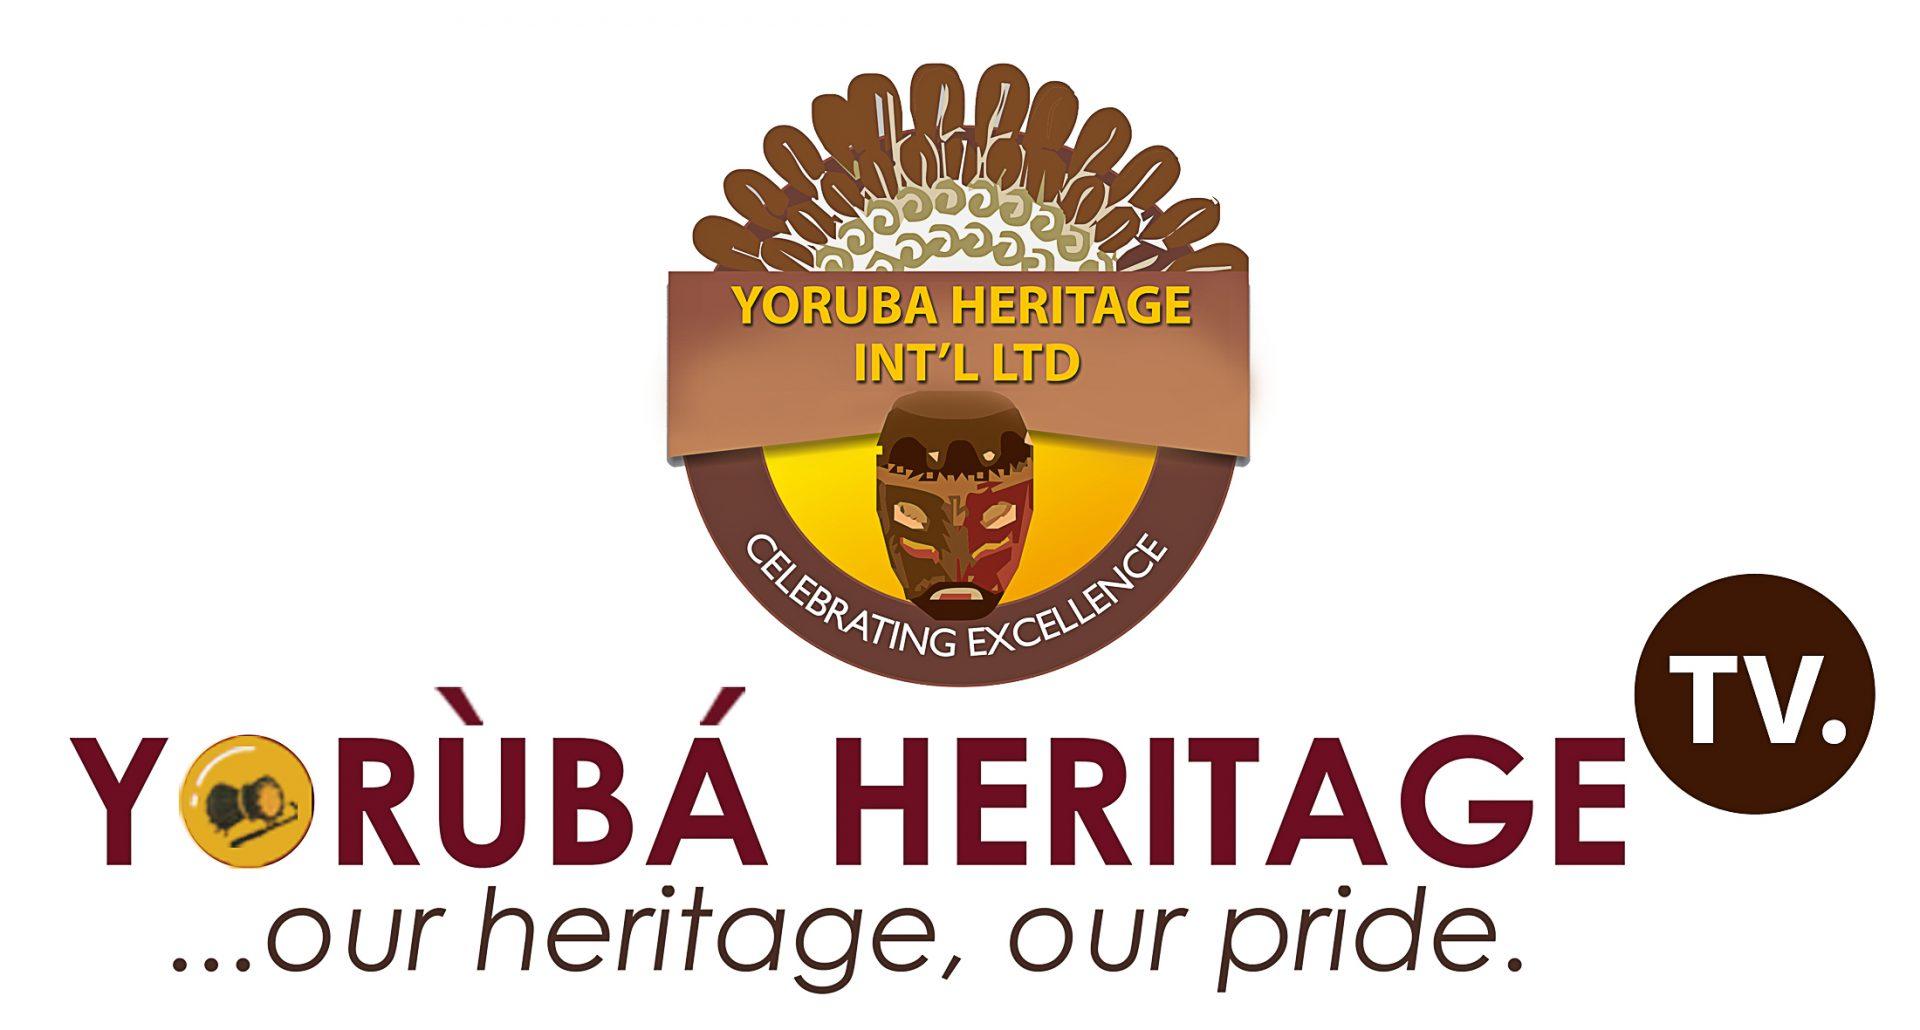 Yoruba Heritage Int'l Limited